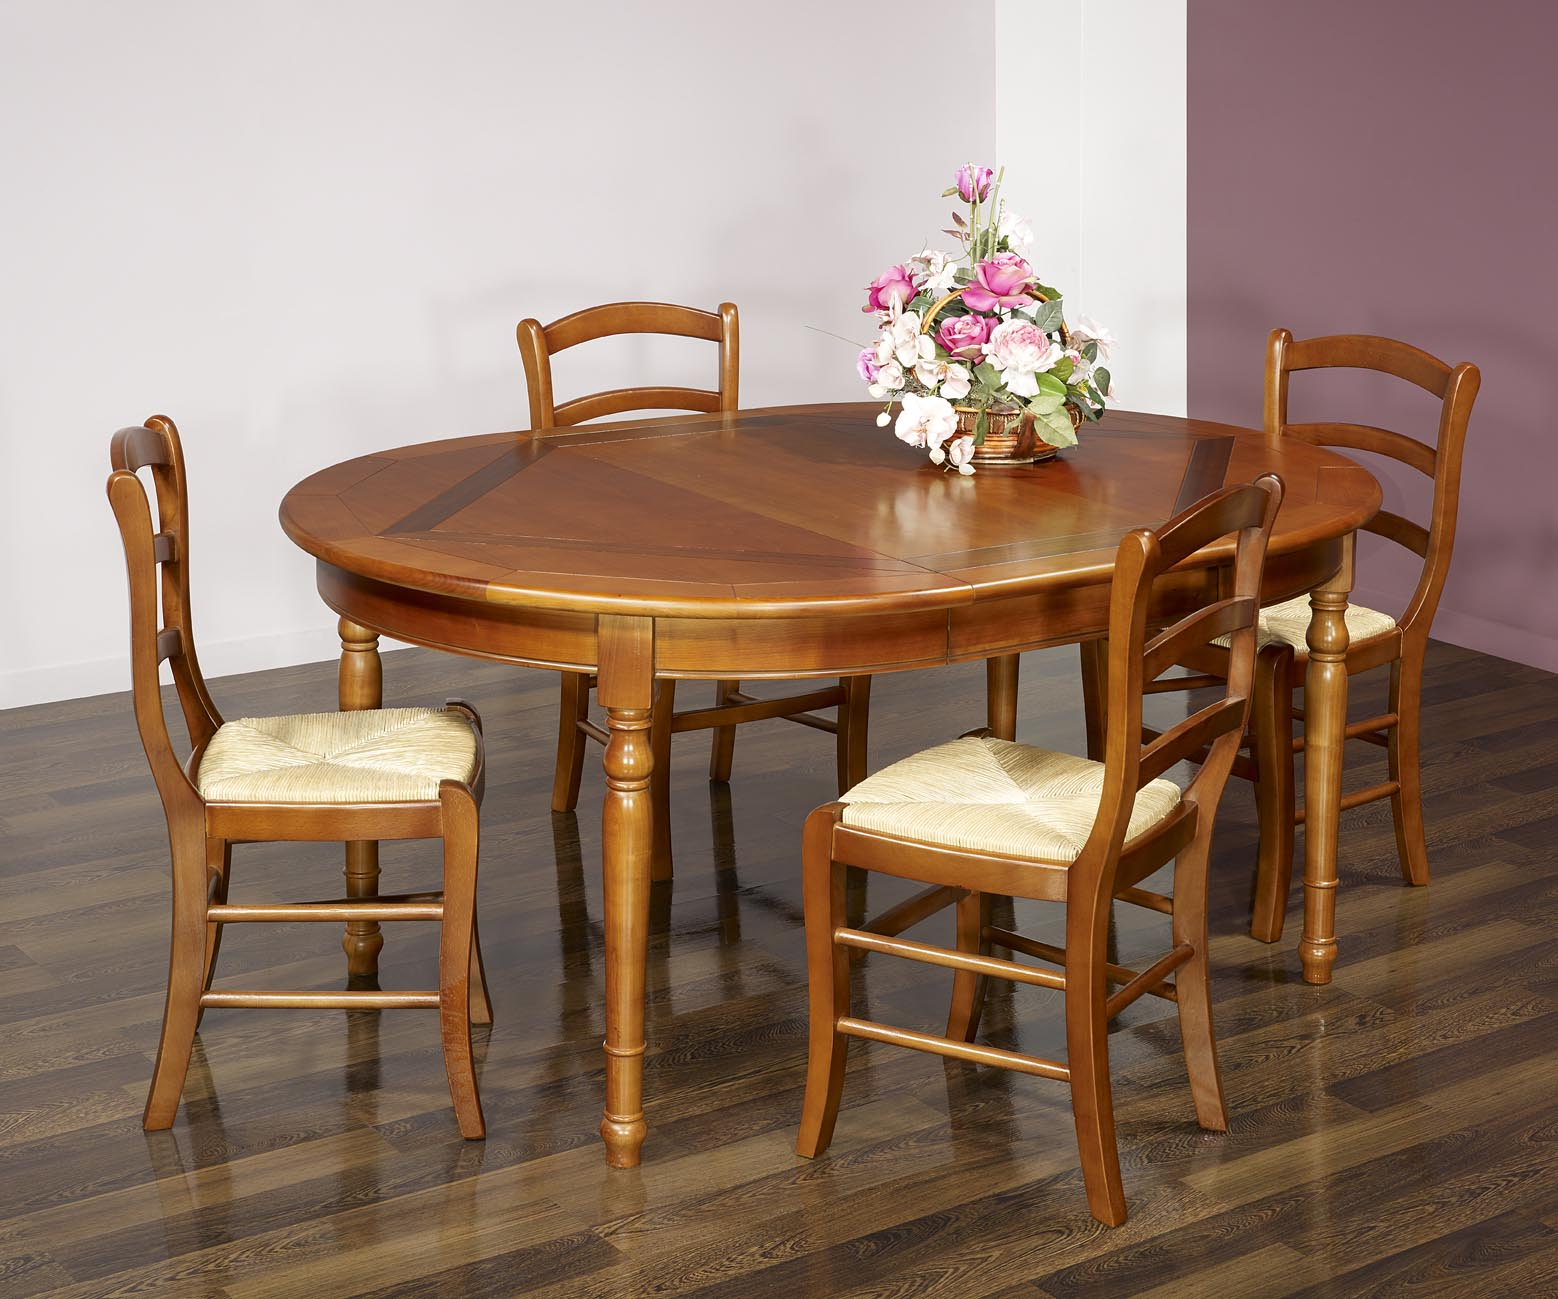 table ronde 4 pieds plateau marquett en merisier de style. Black Bedroom Furniture Sets. Home Design Ideas